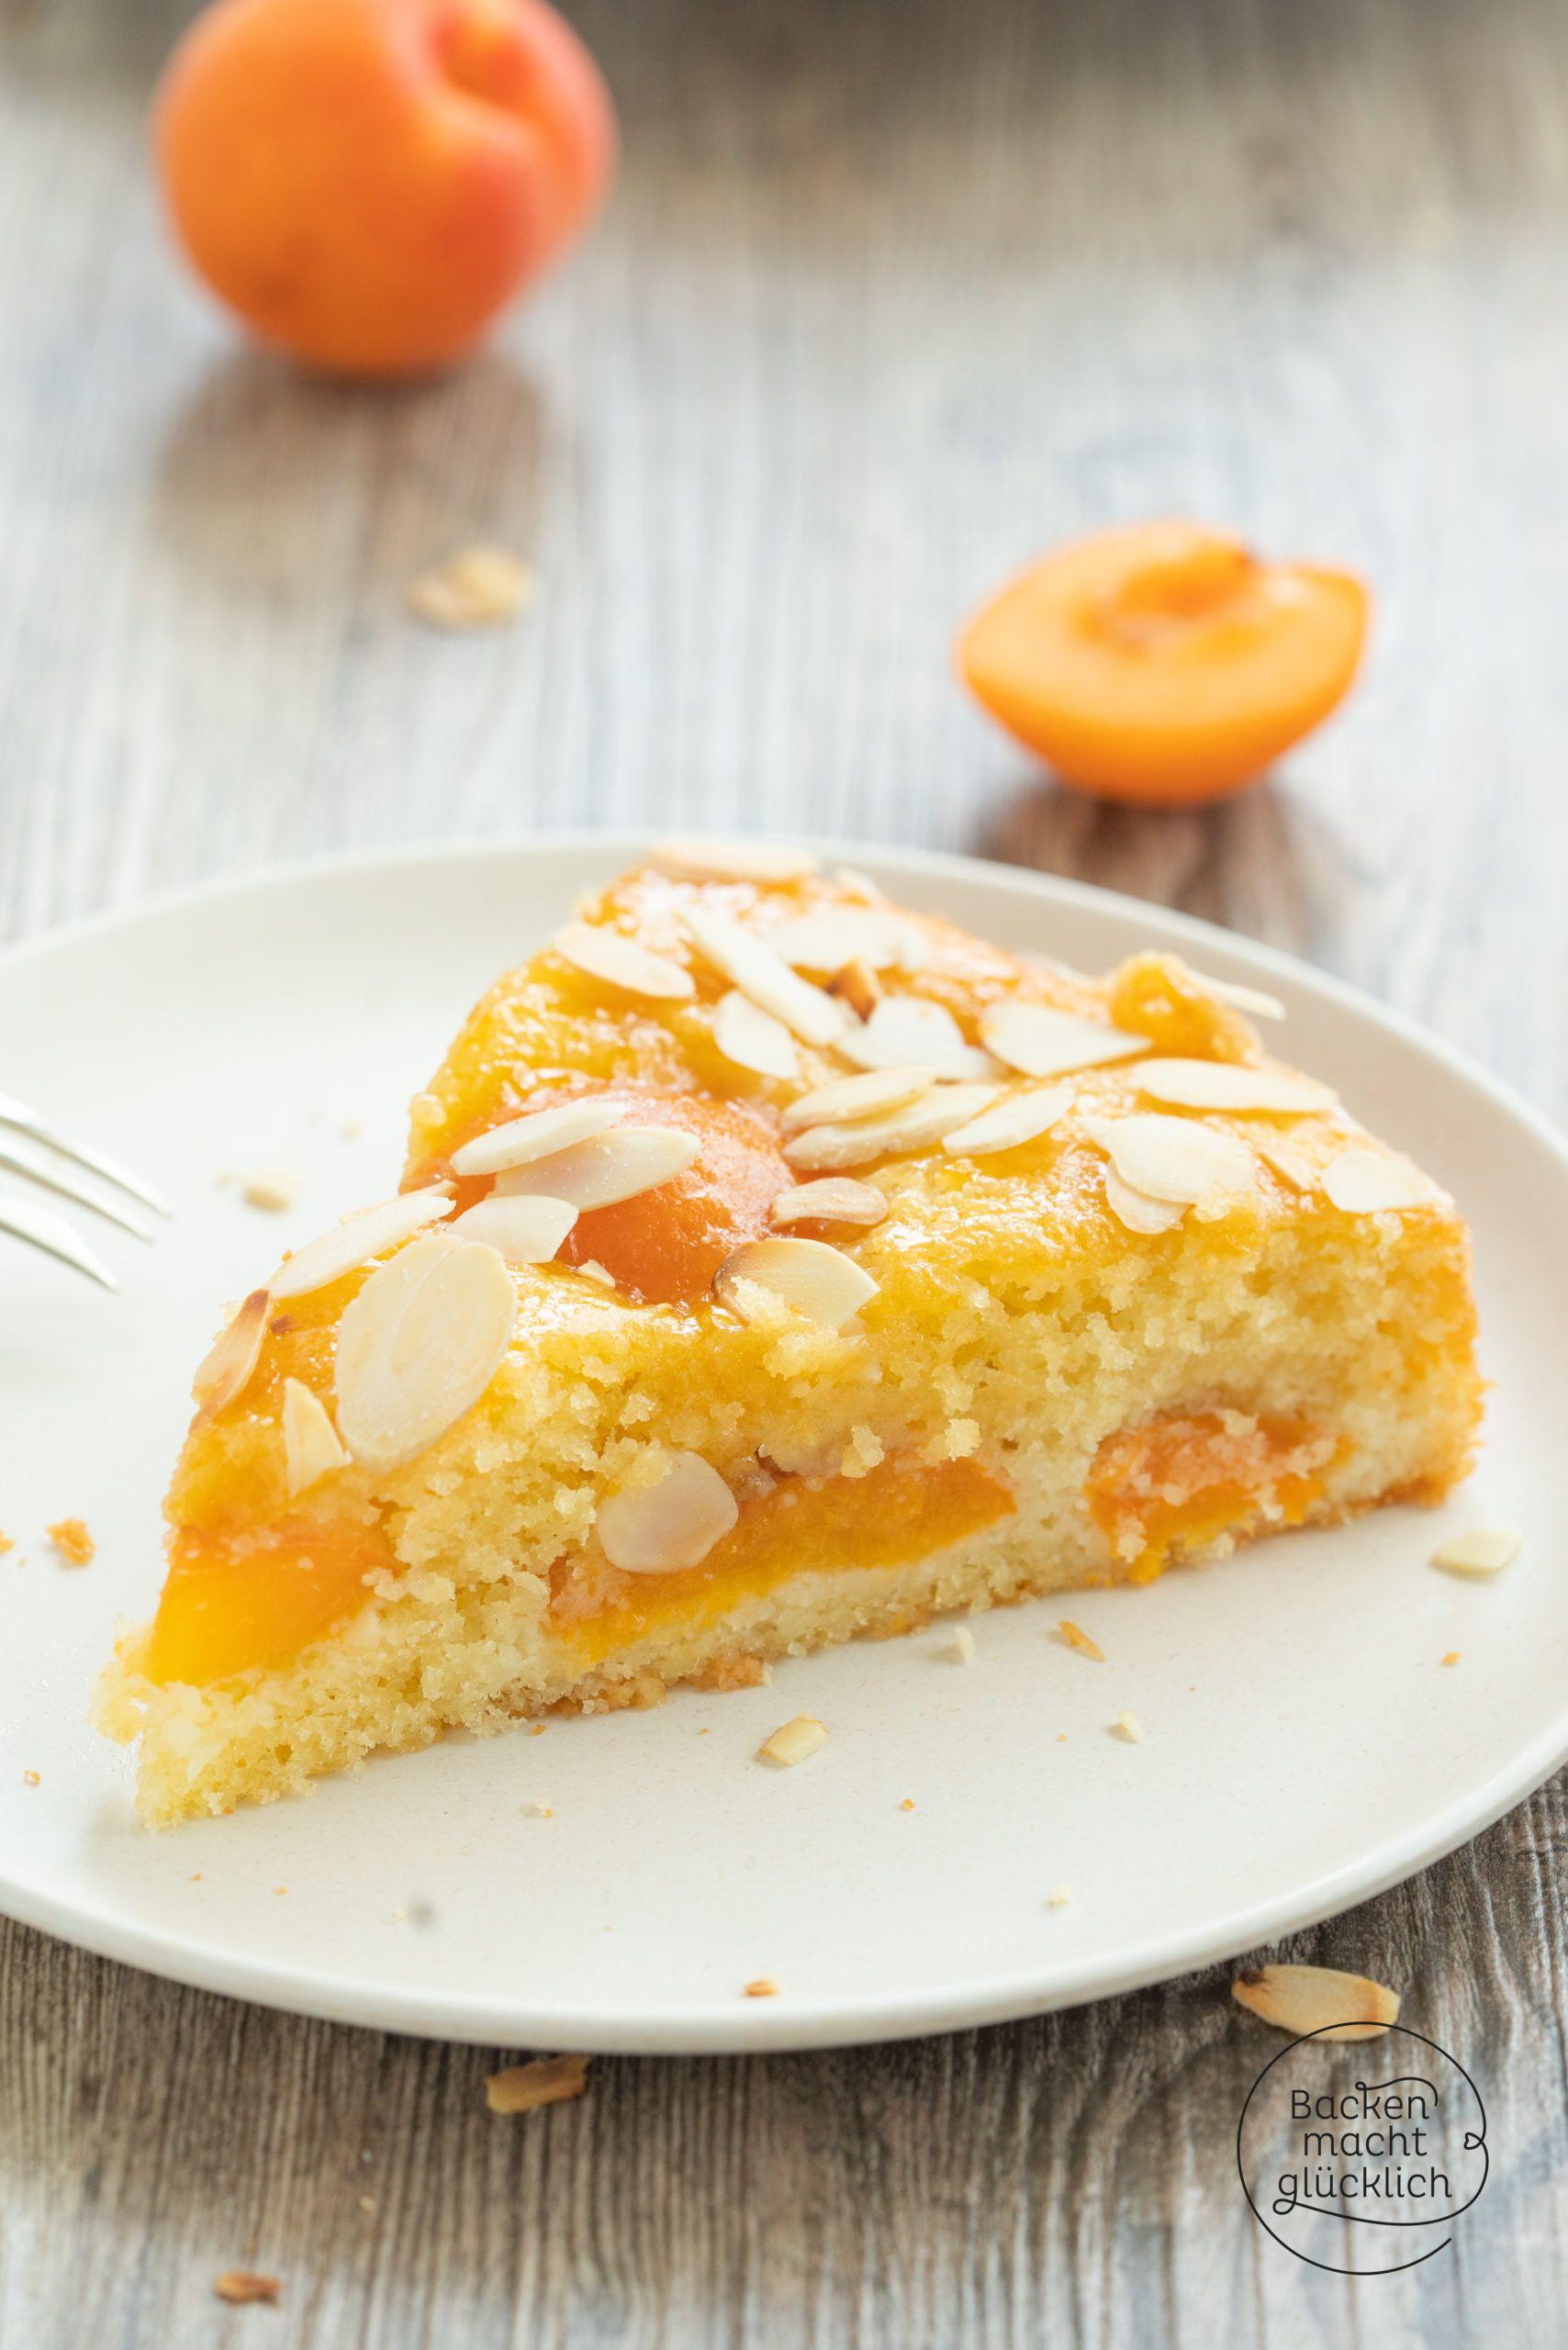 9c6b337fee4314e2b8a9d6fe801ae144 - Einfache Kuchen Rezepte